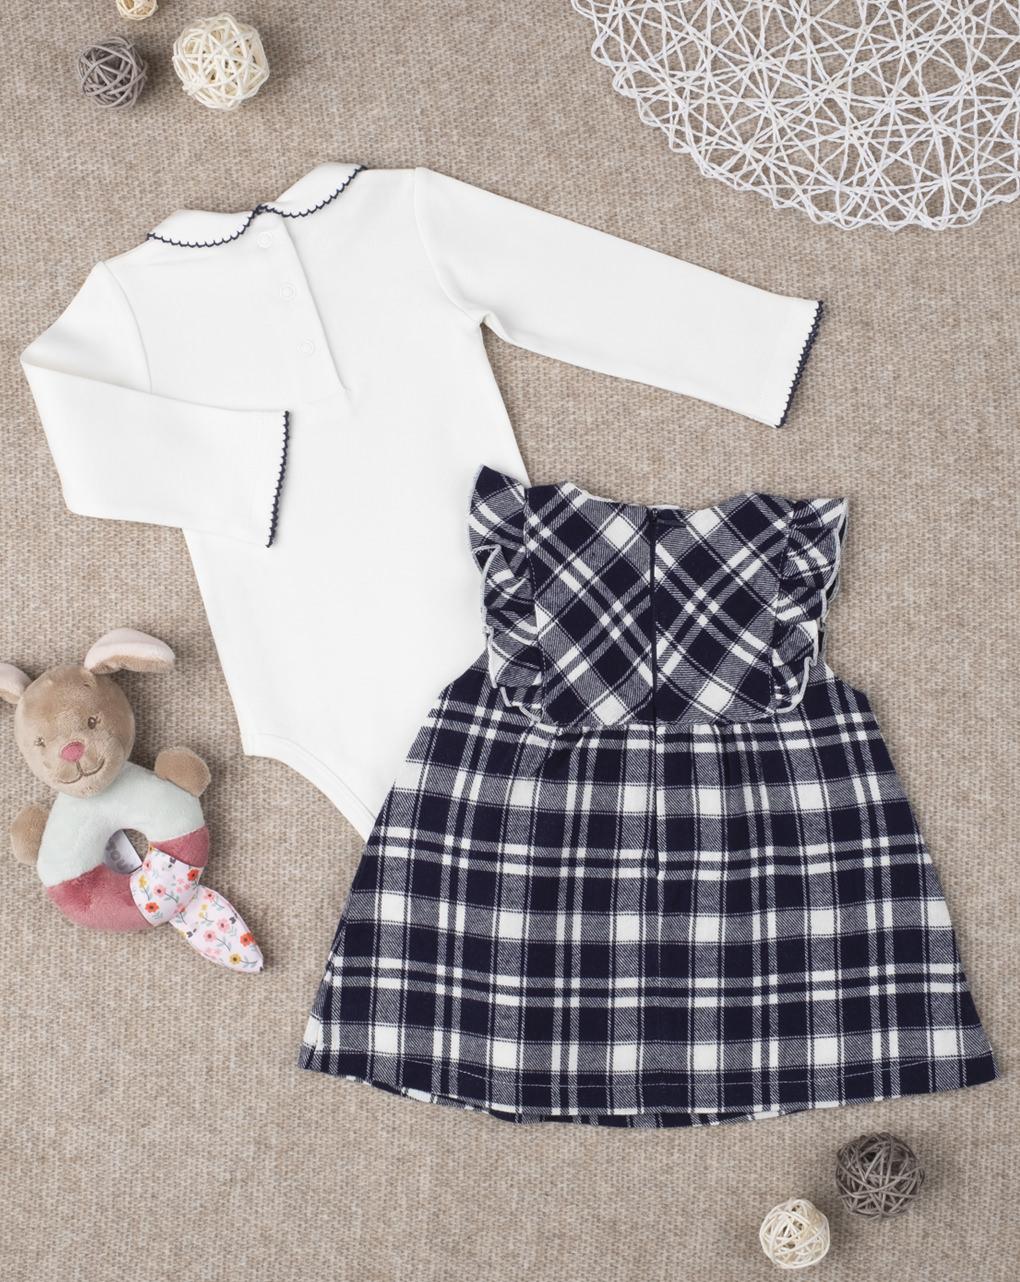 Vestido e corpo completo para menina - Prénatal